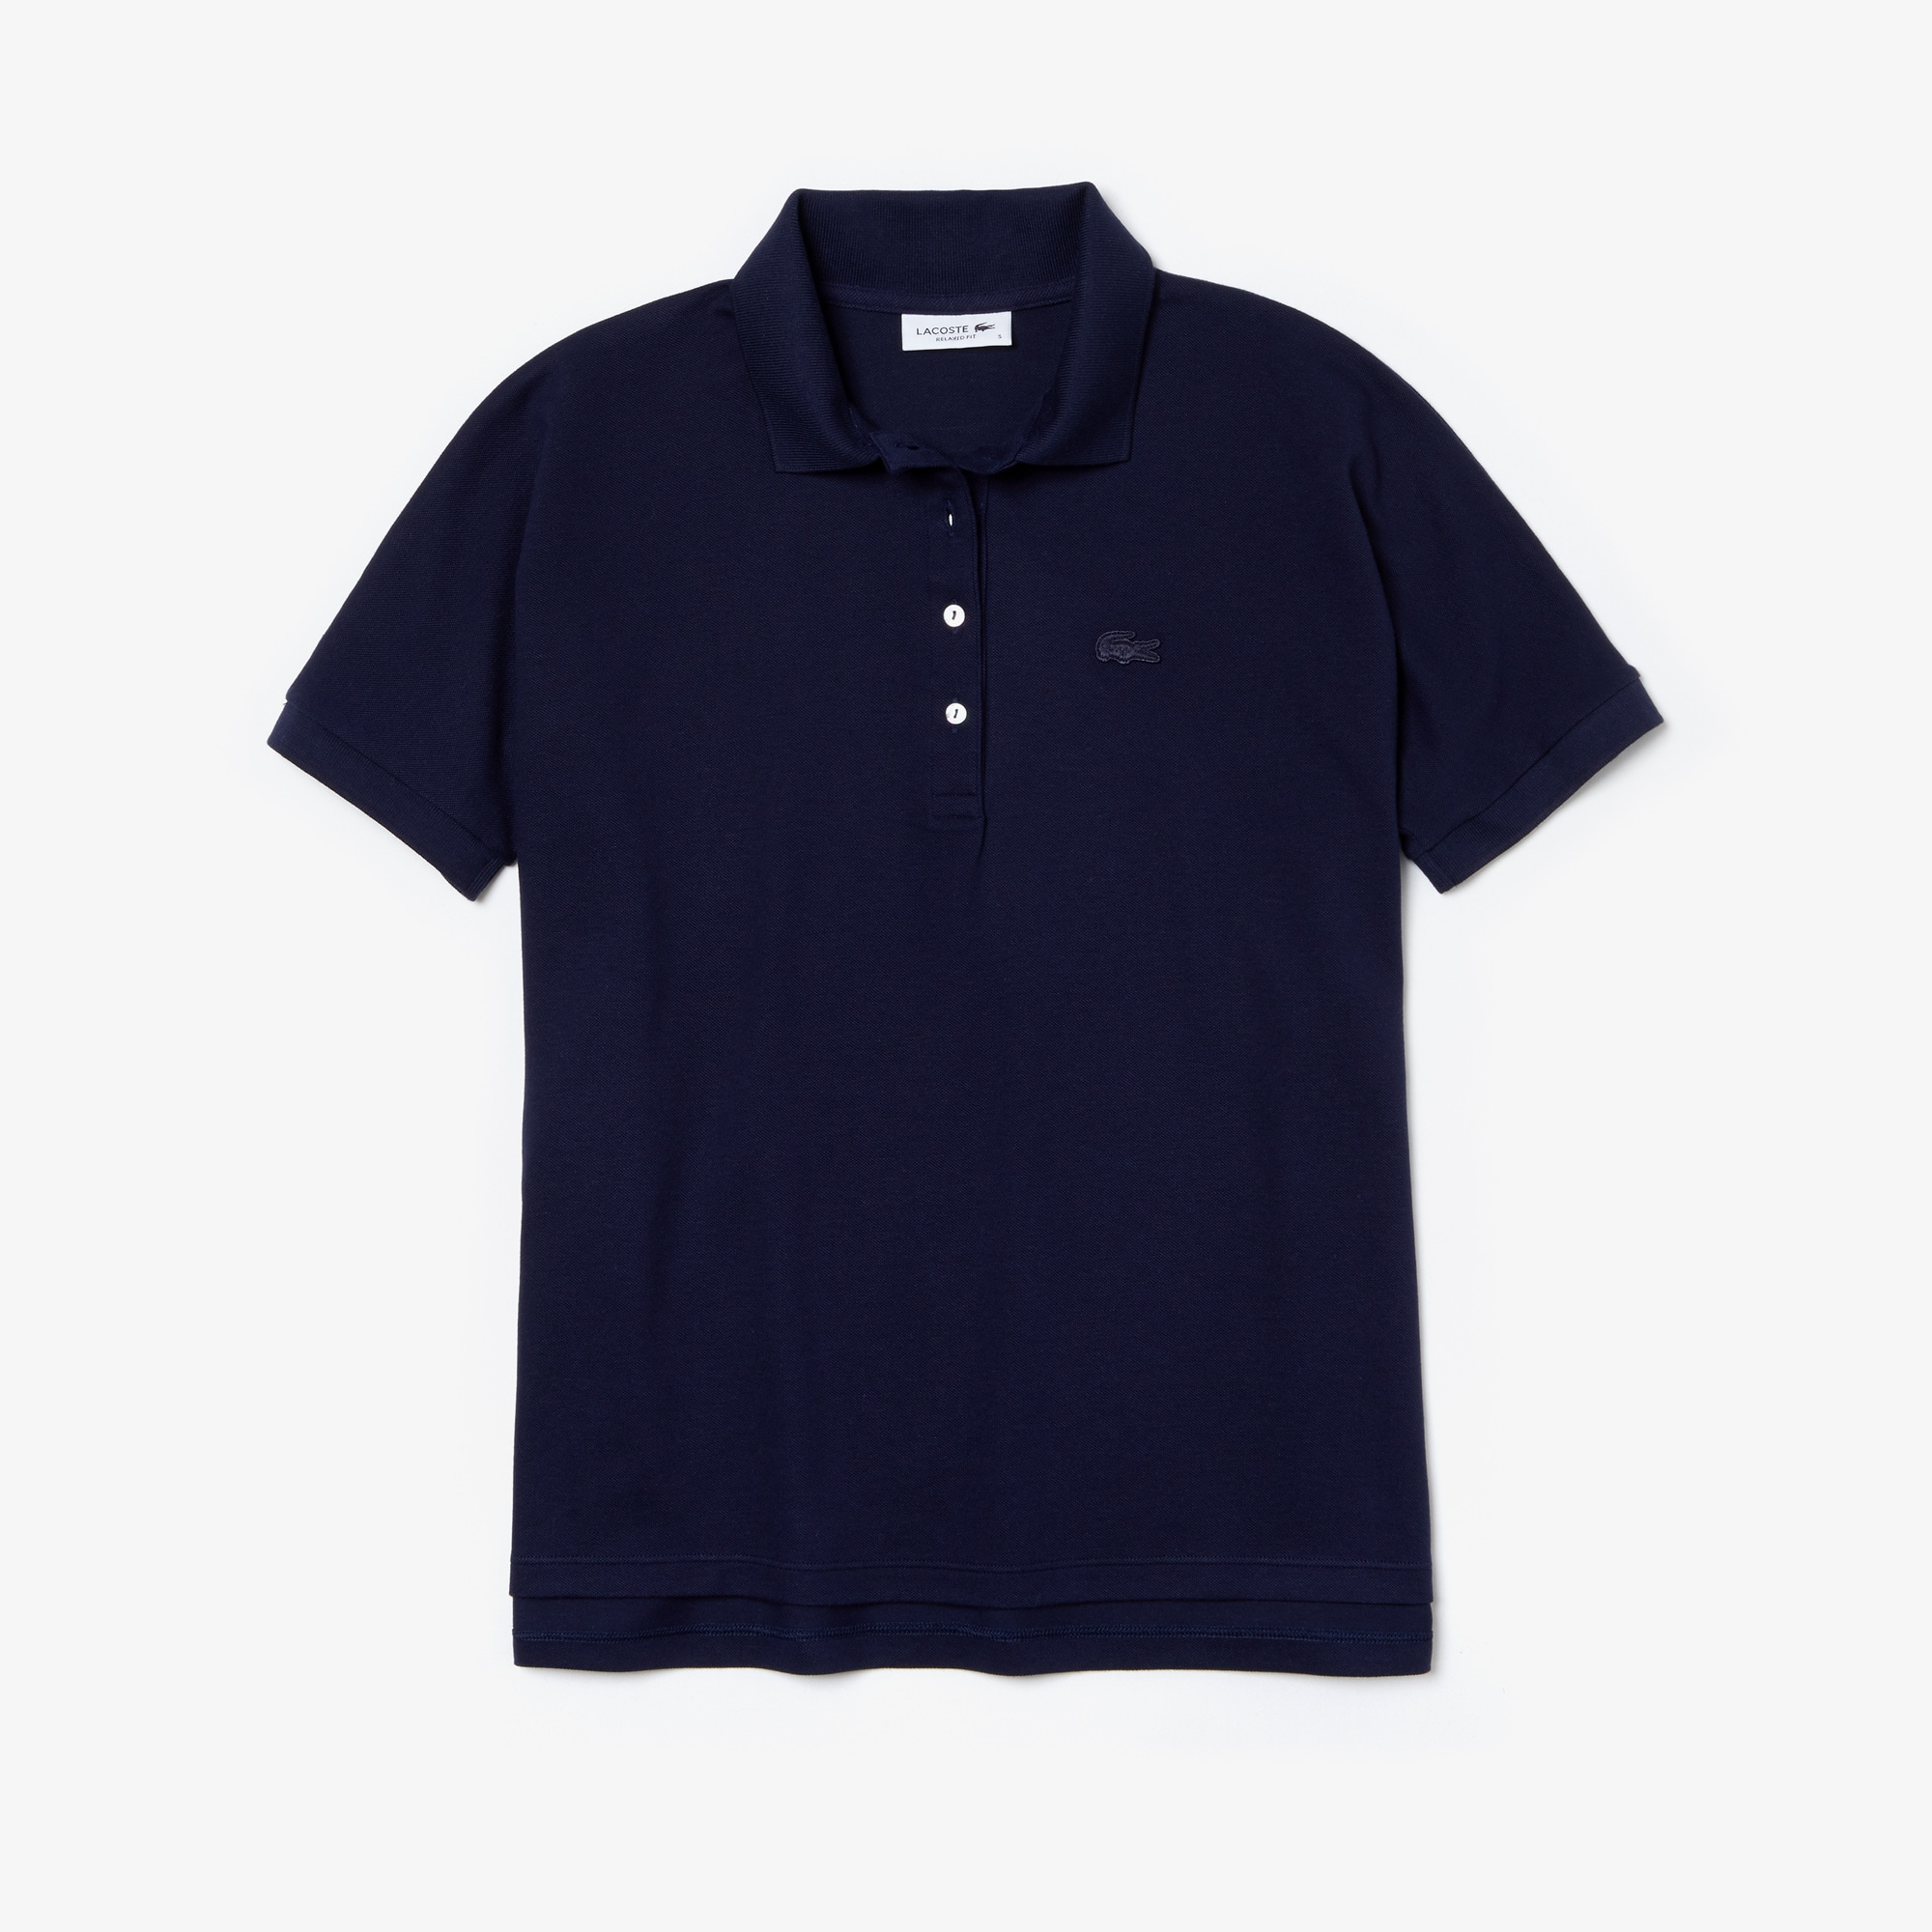 Women's Lacoste Relax Fit Flowing Stretch Cotton Piqué Polo Shirt